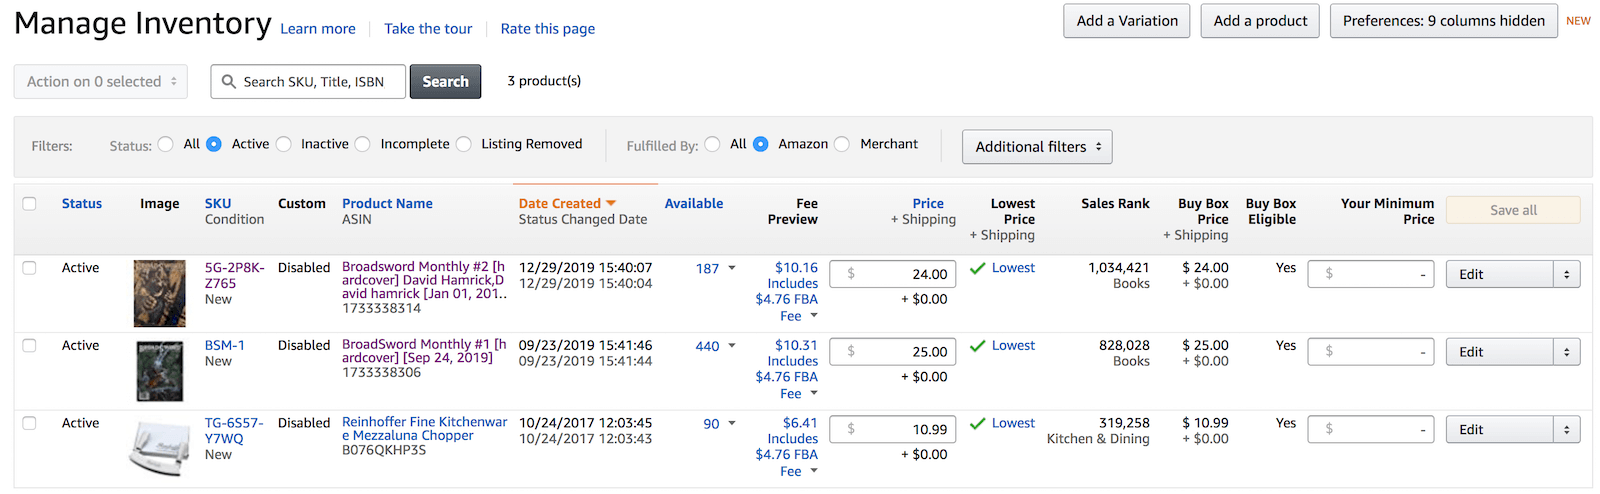 Buy Box eligibility screenshot